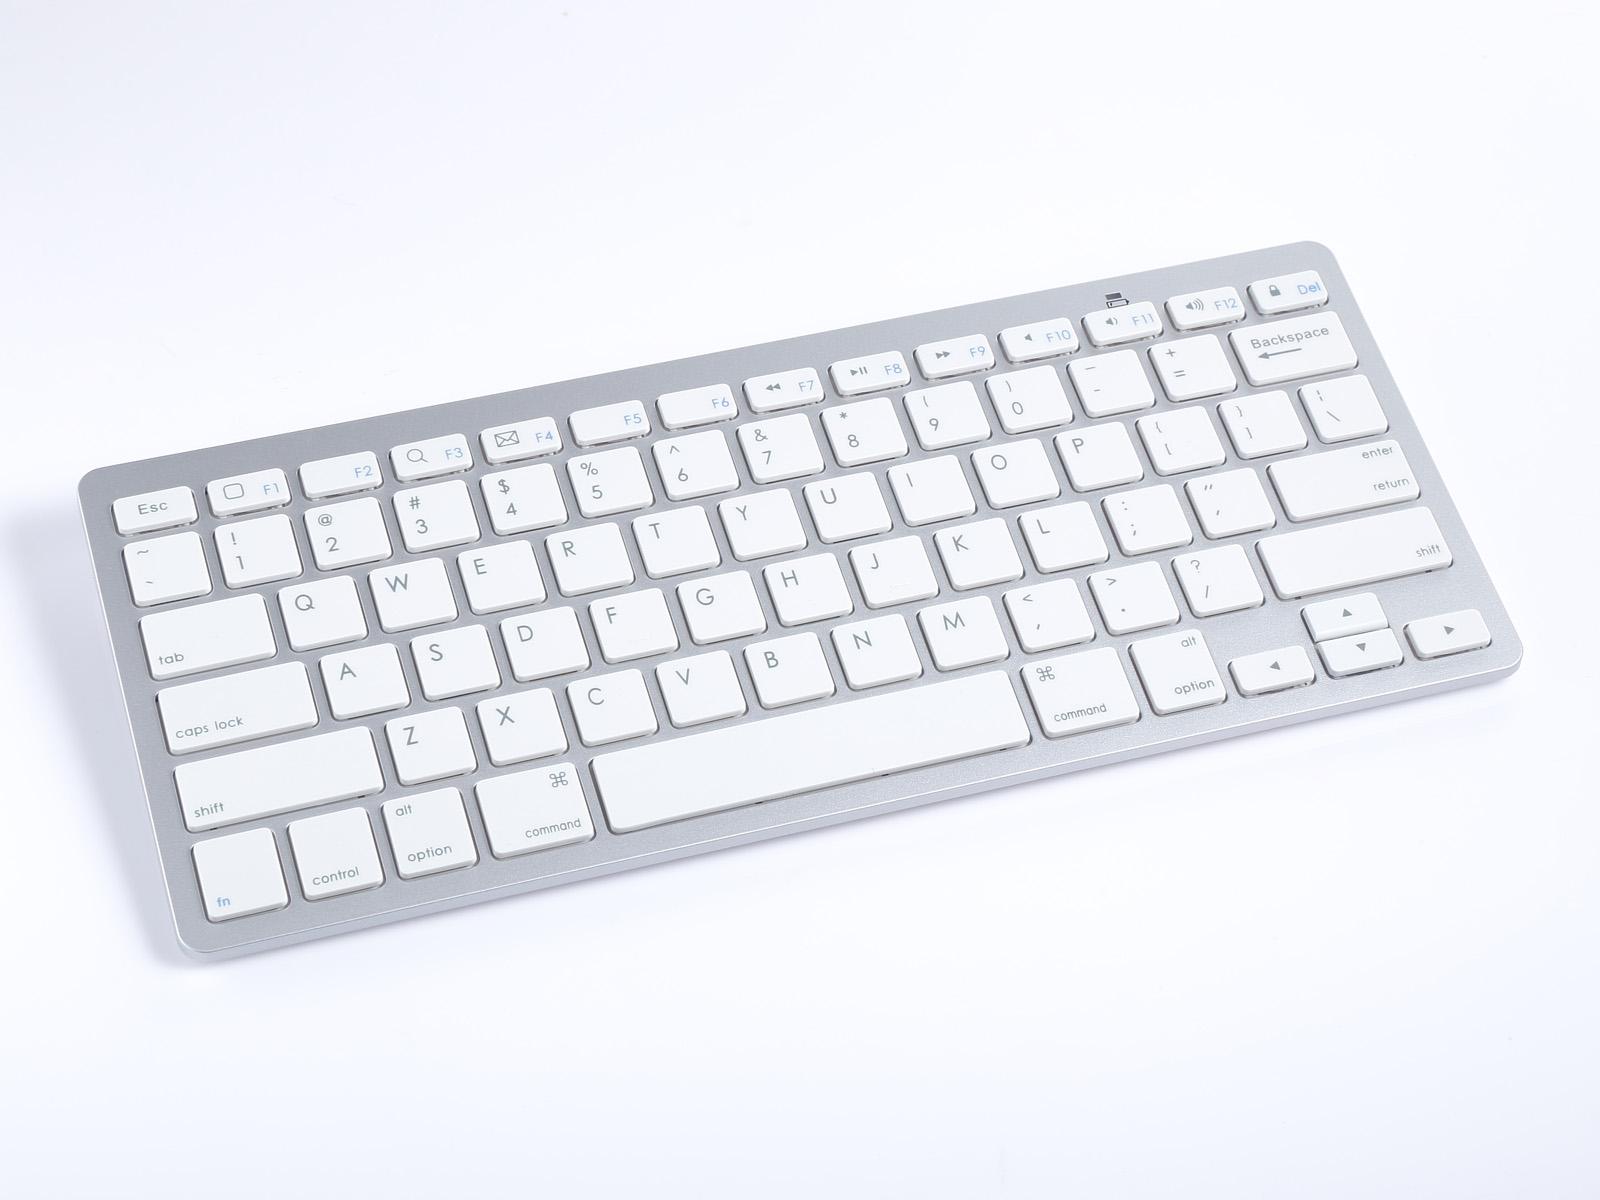 Ulak Ultra Slim Bluetooth Wireless Keyboard For Amazon